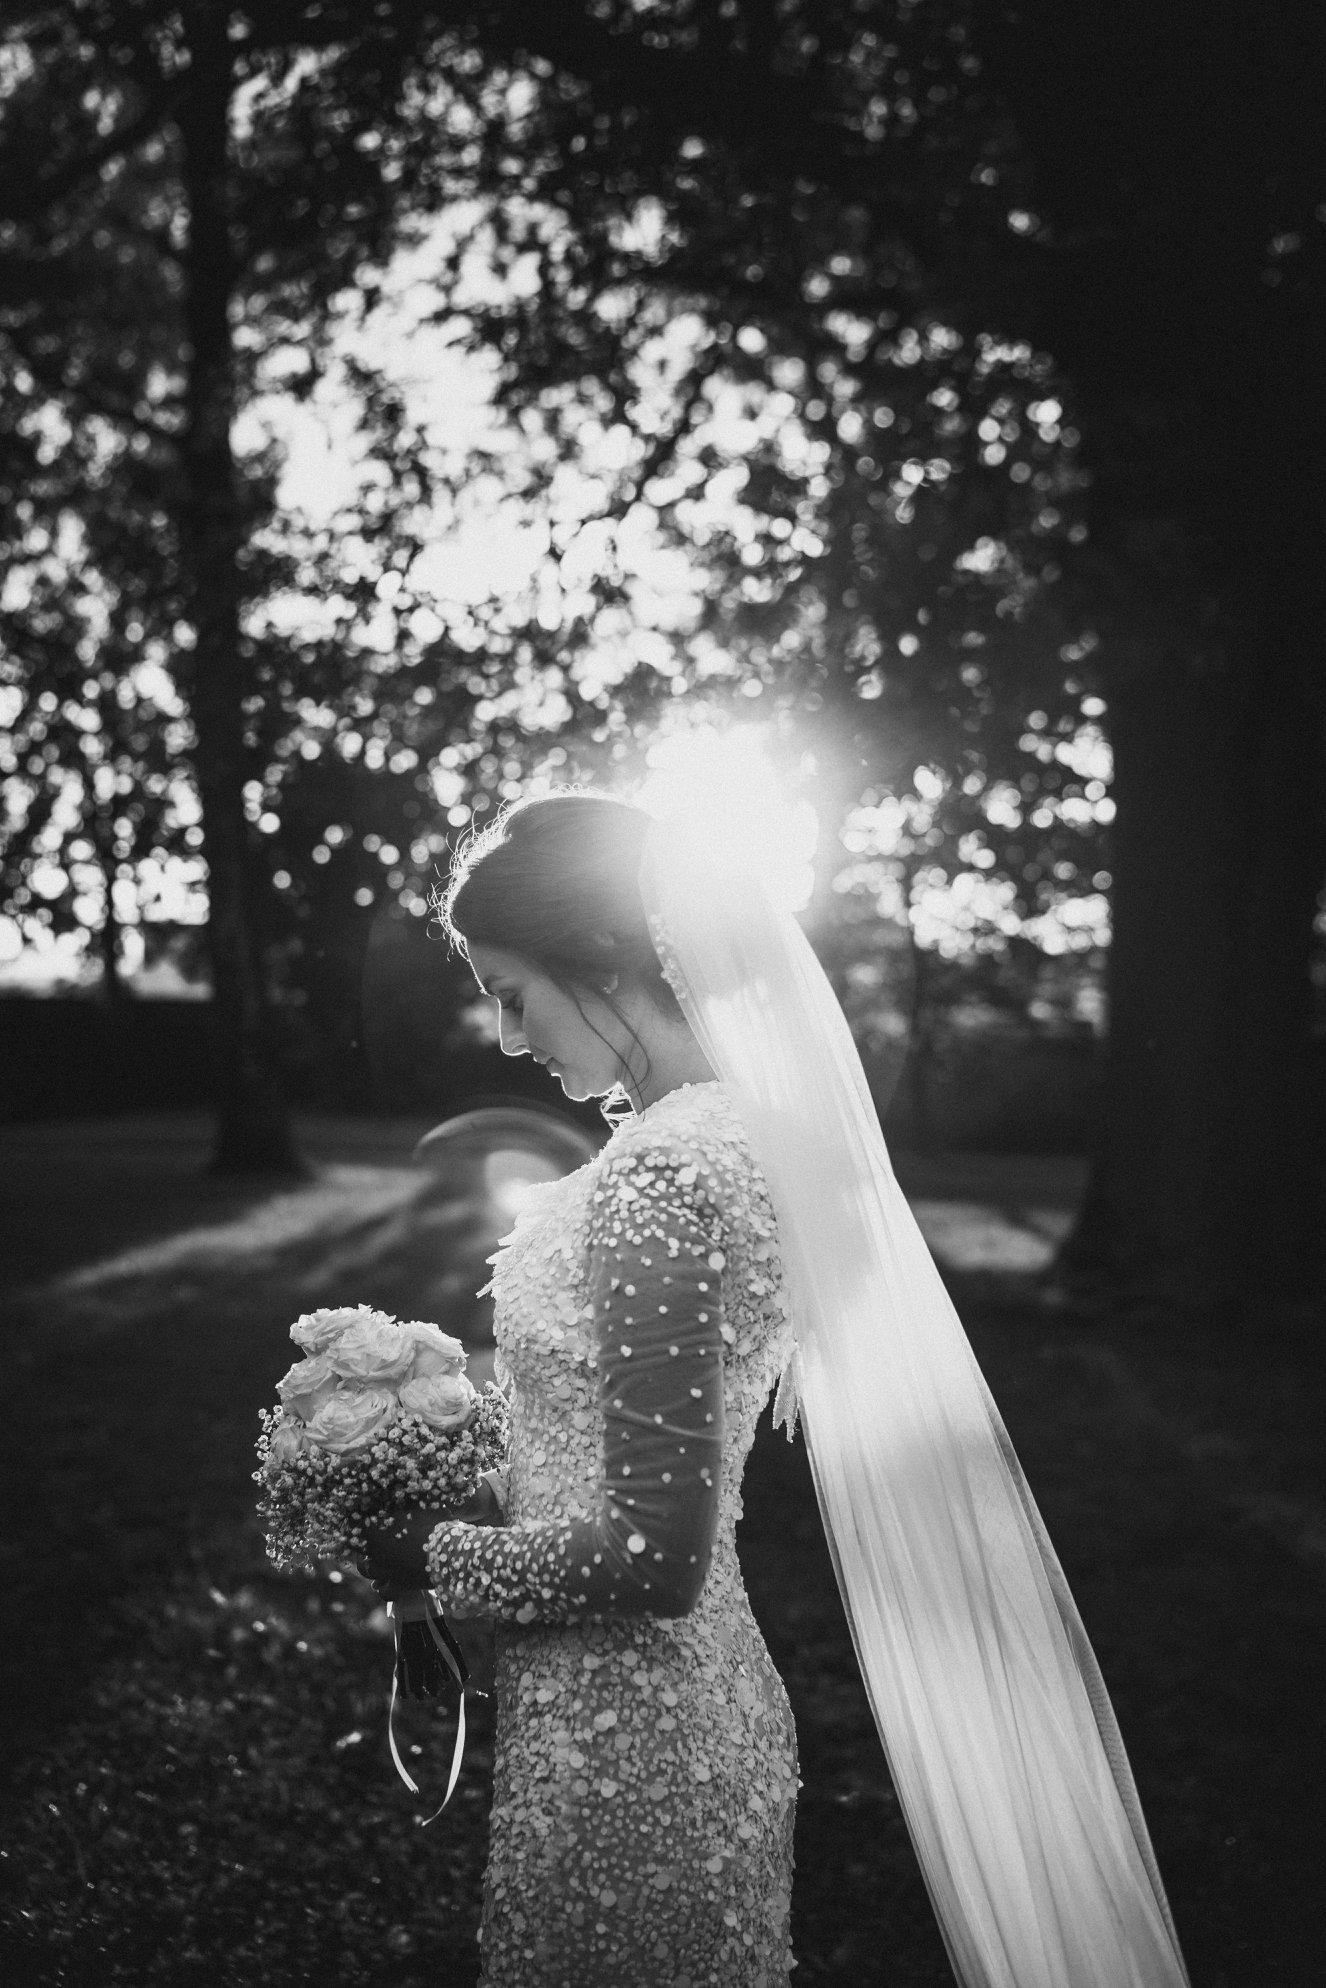 svadobny-fotografjpg